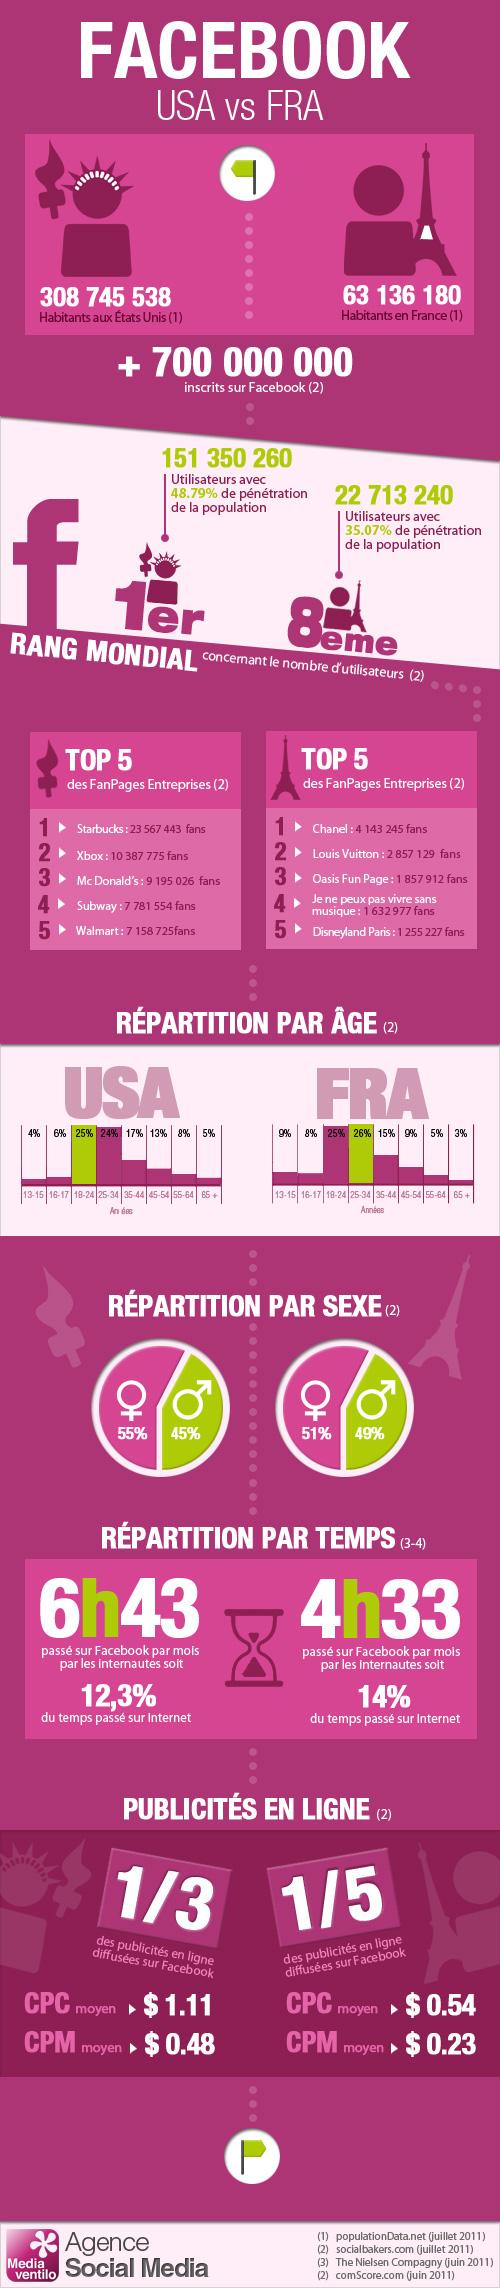 facebook-usa-vs-france.jpg